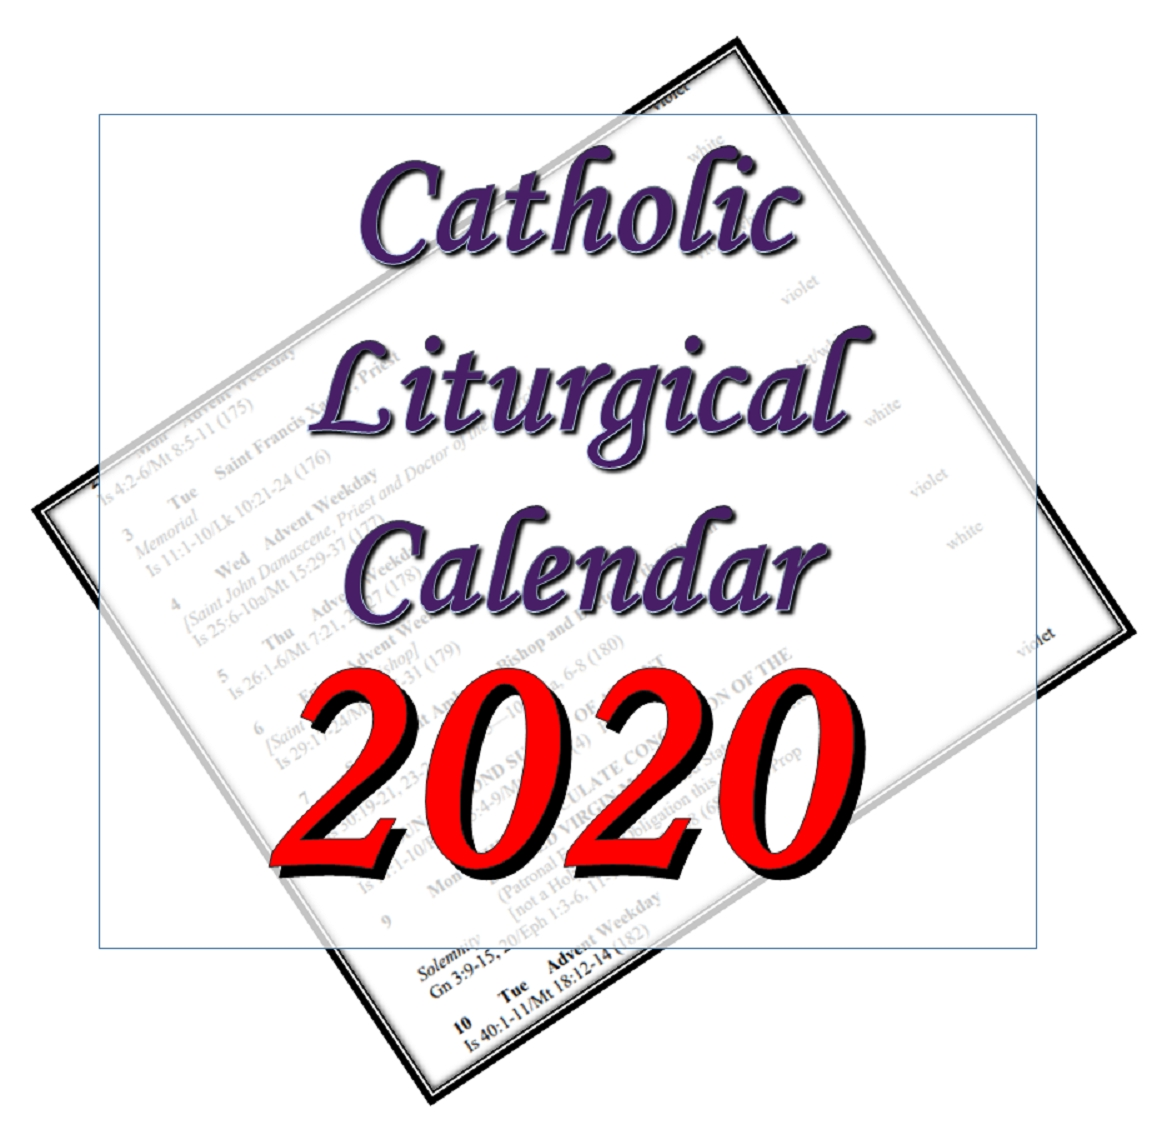 Liturgytools: Catholic Liturgical Calendars For 2020 within The Year 2020 Liturgical Calendar